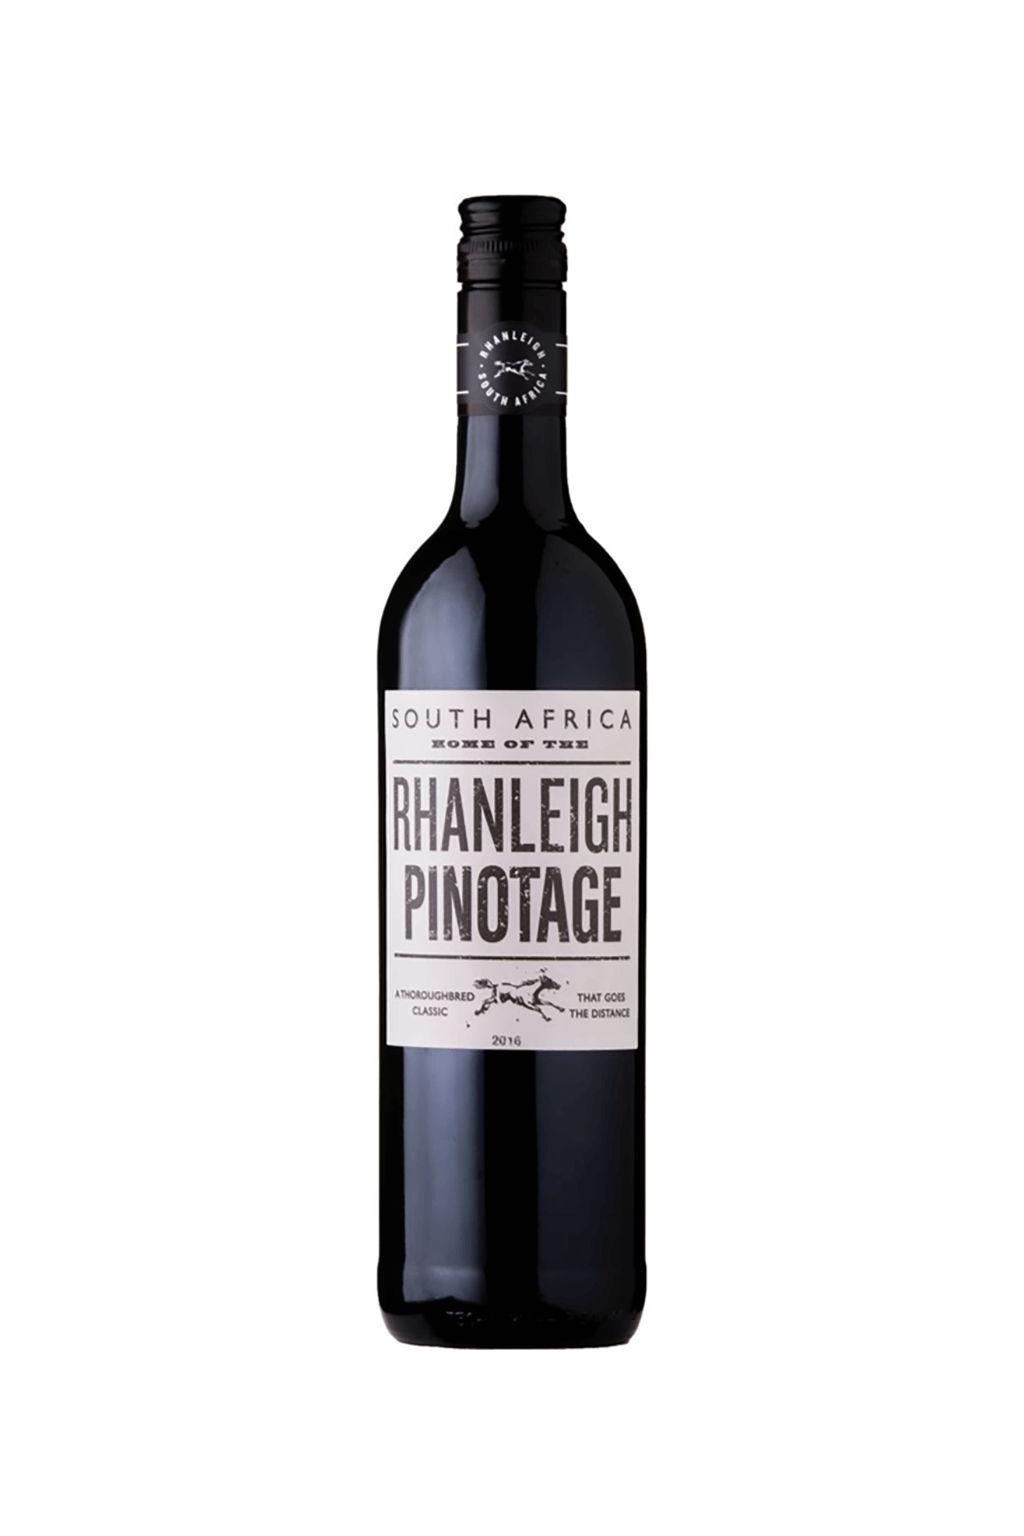 Pinotage Rhanleigh